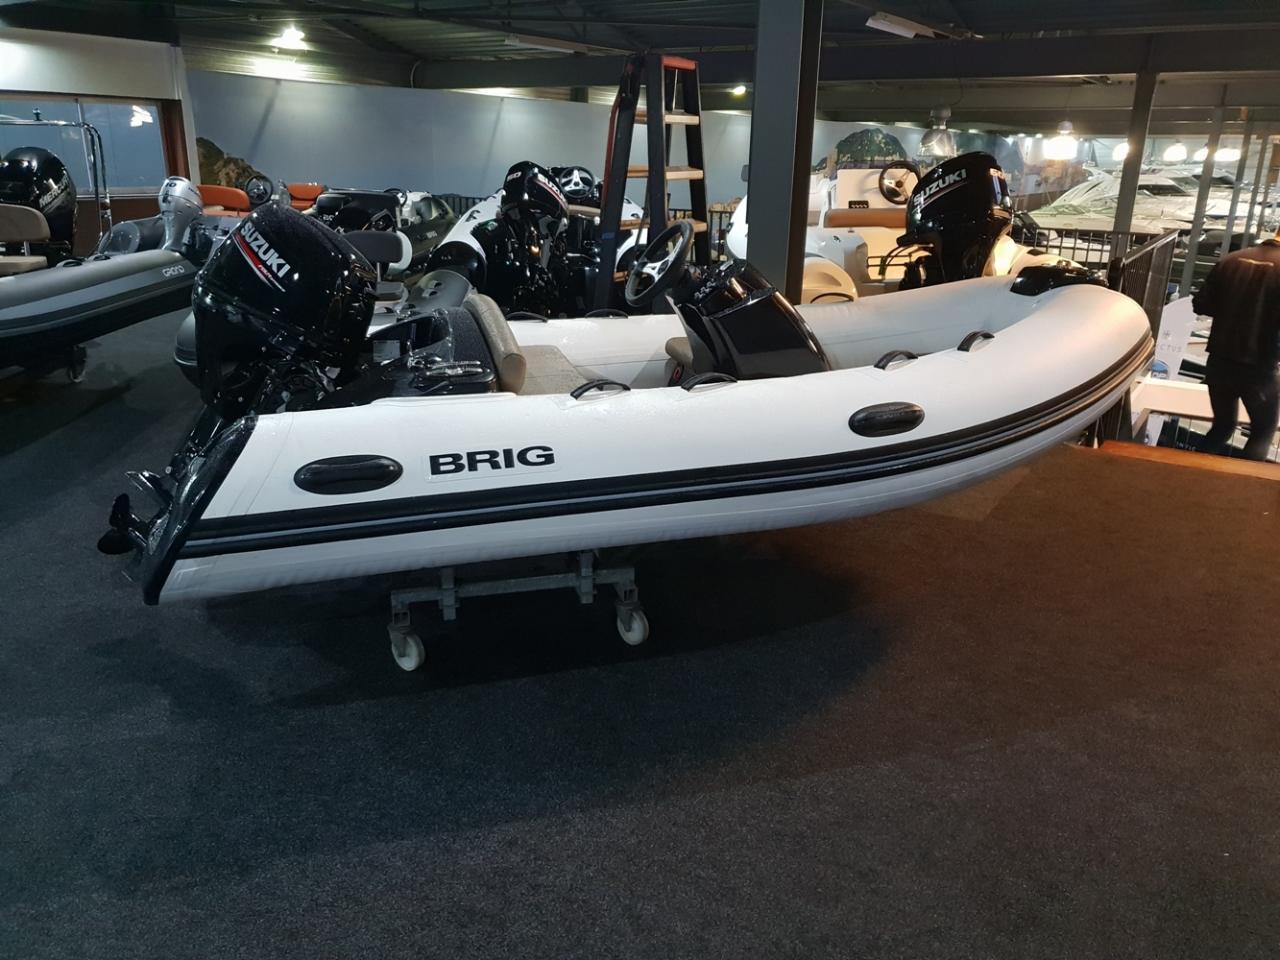 Brig Eagle 340 rib met Suzuki 30 pk 1